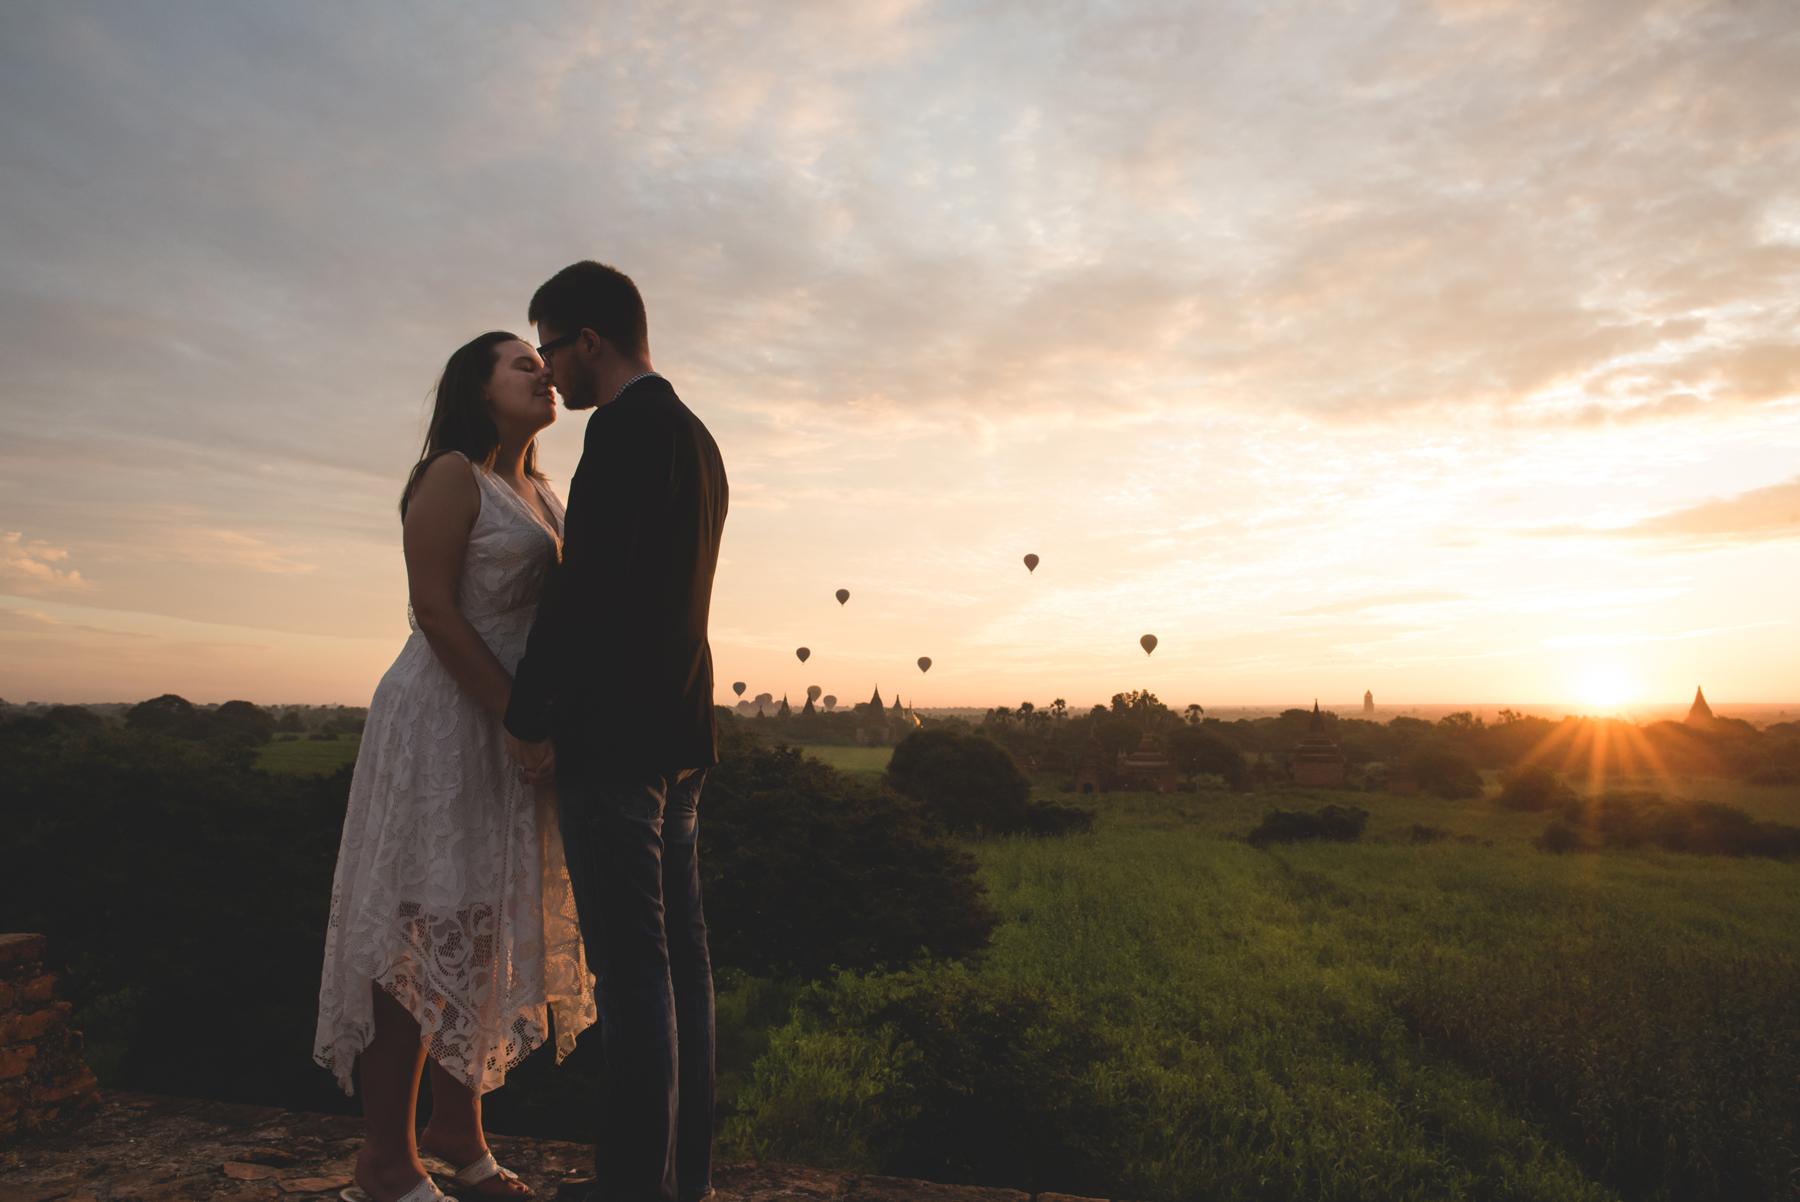 bagan-wedding-photo-shoot